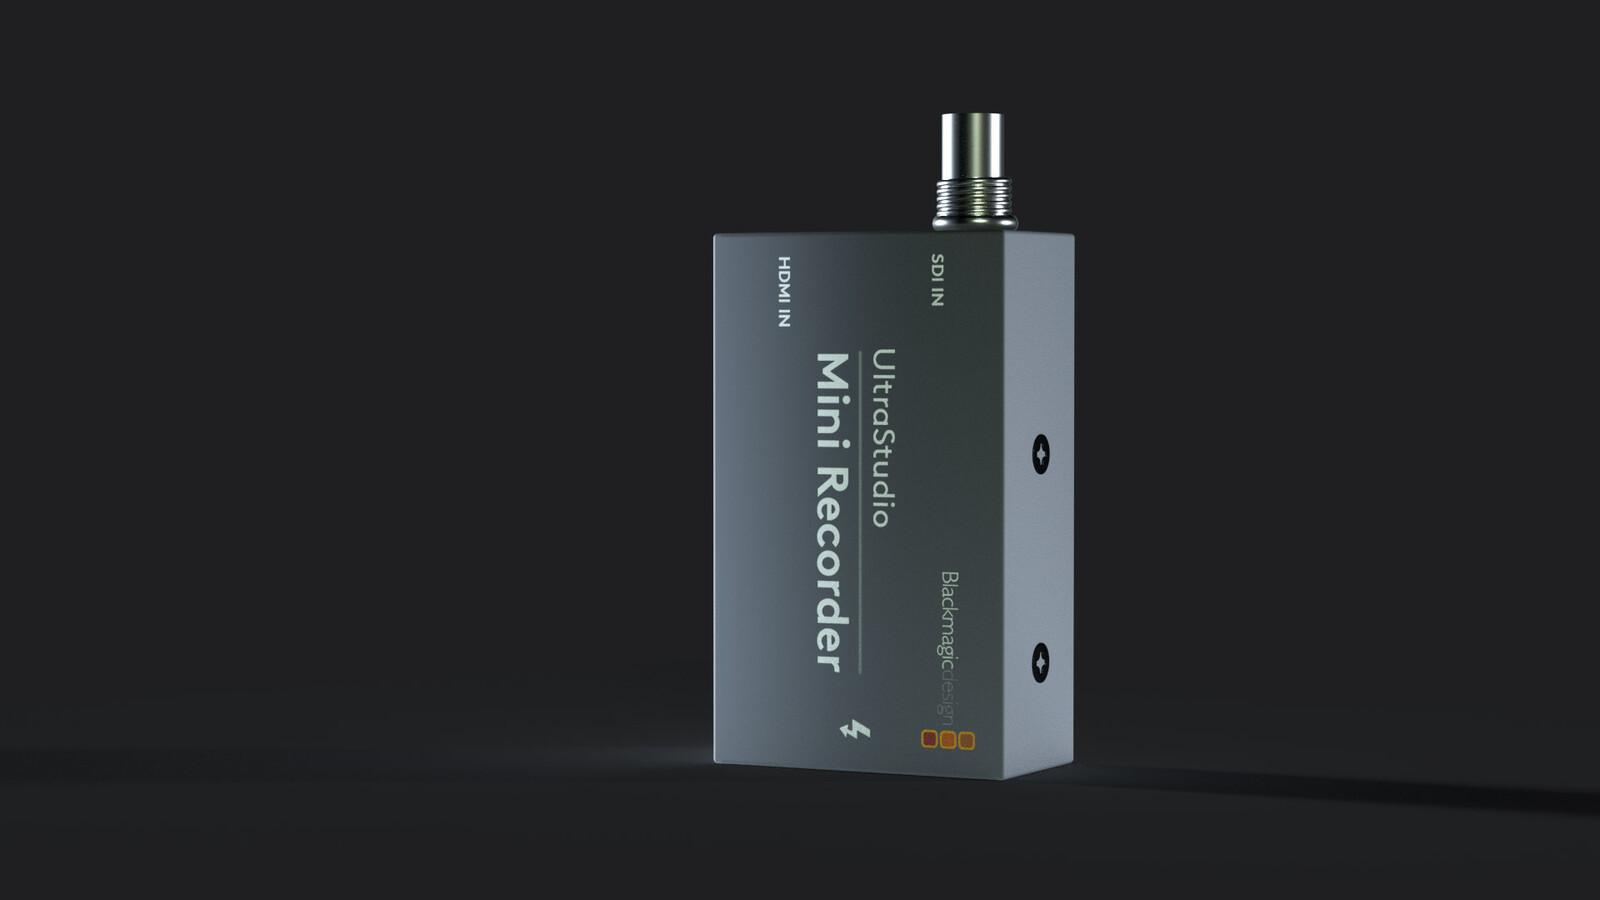 Blackmagic UltraStudio Mini Recorder - Product Modeling